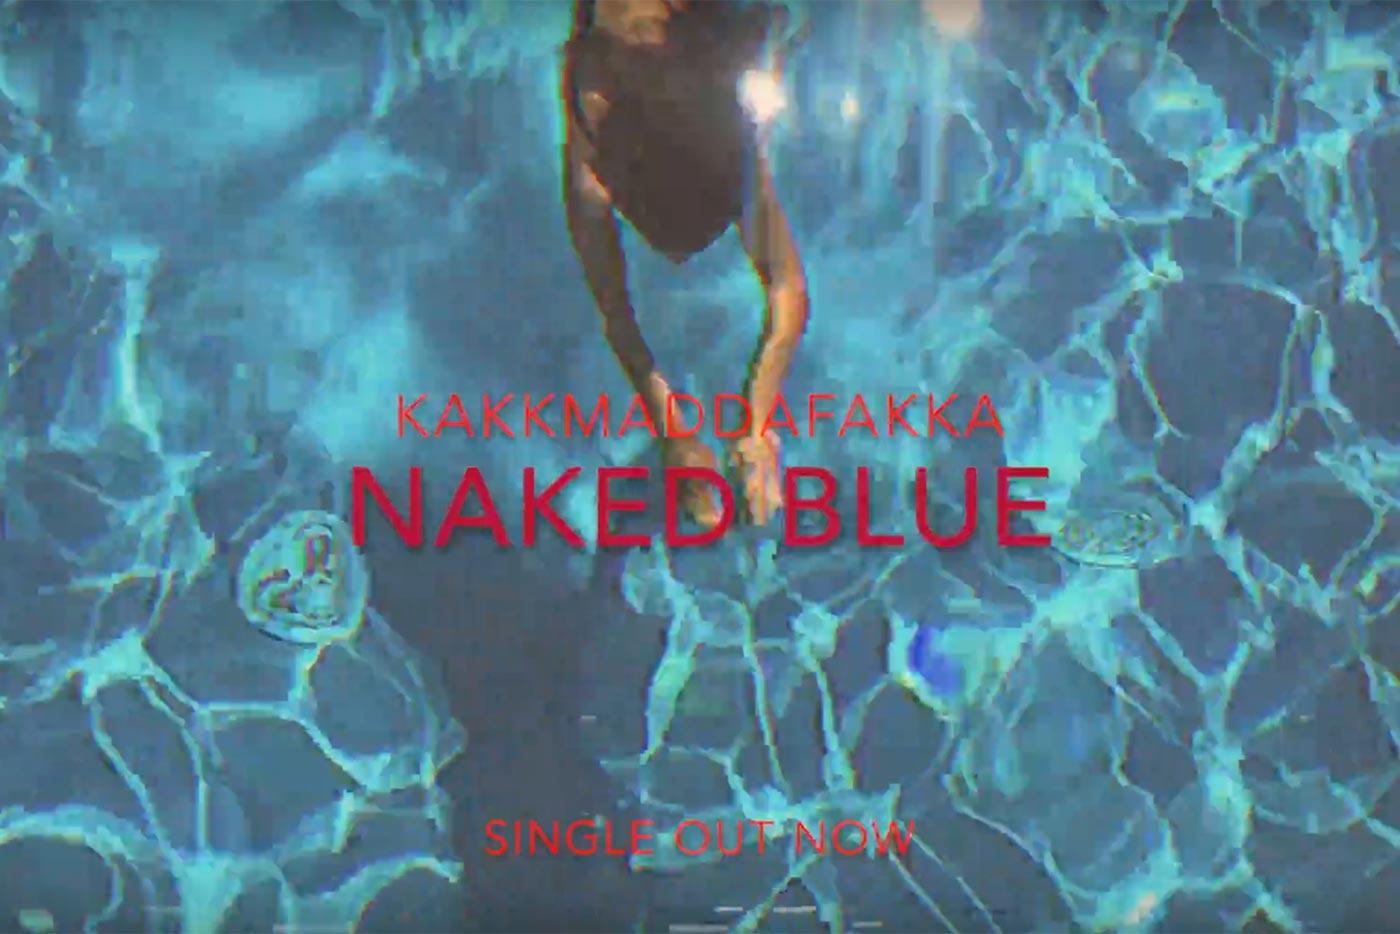 "Estrenamos en exclusiva el videoclip ""Naked Blue"" de Kakkmaddafakka"